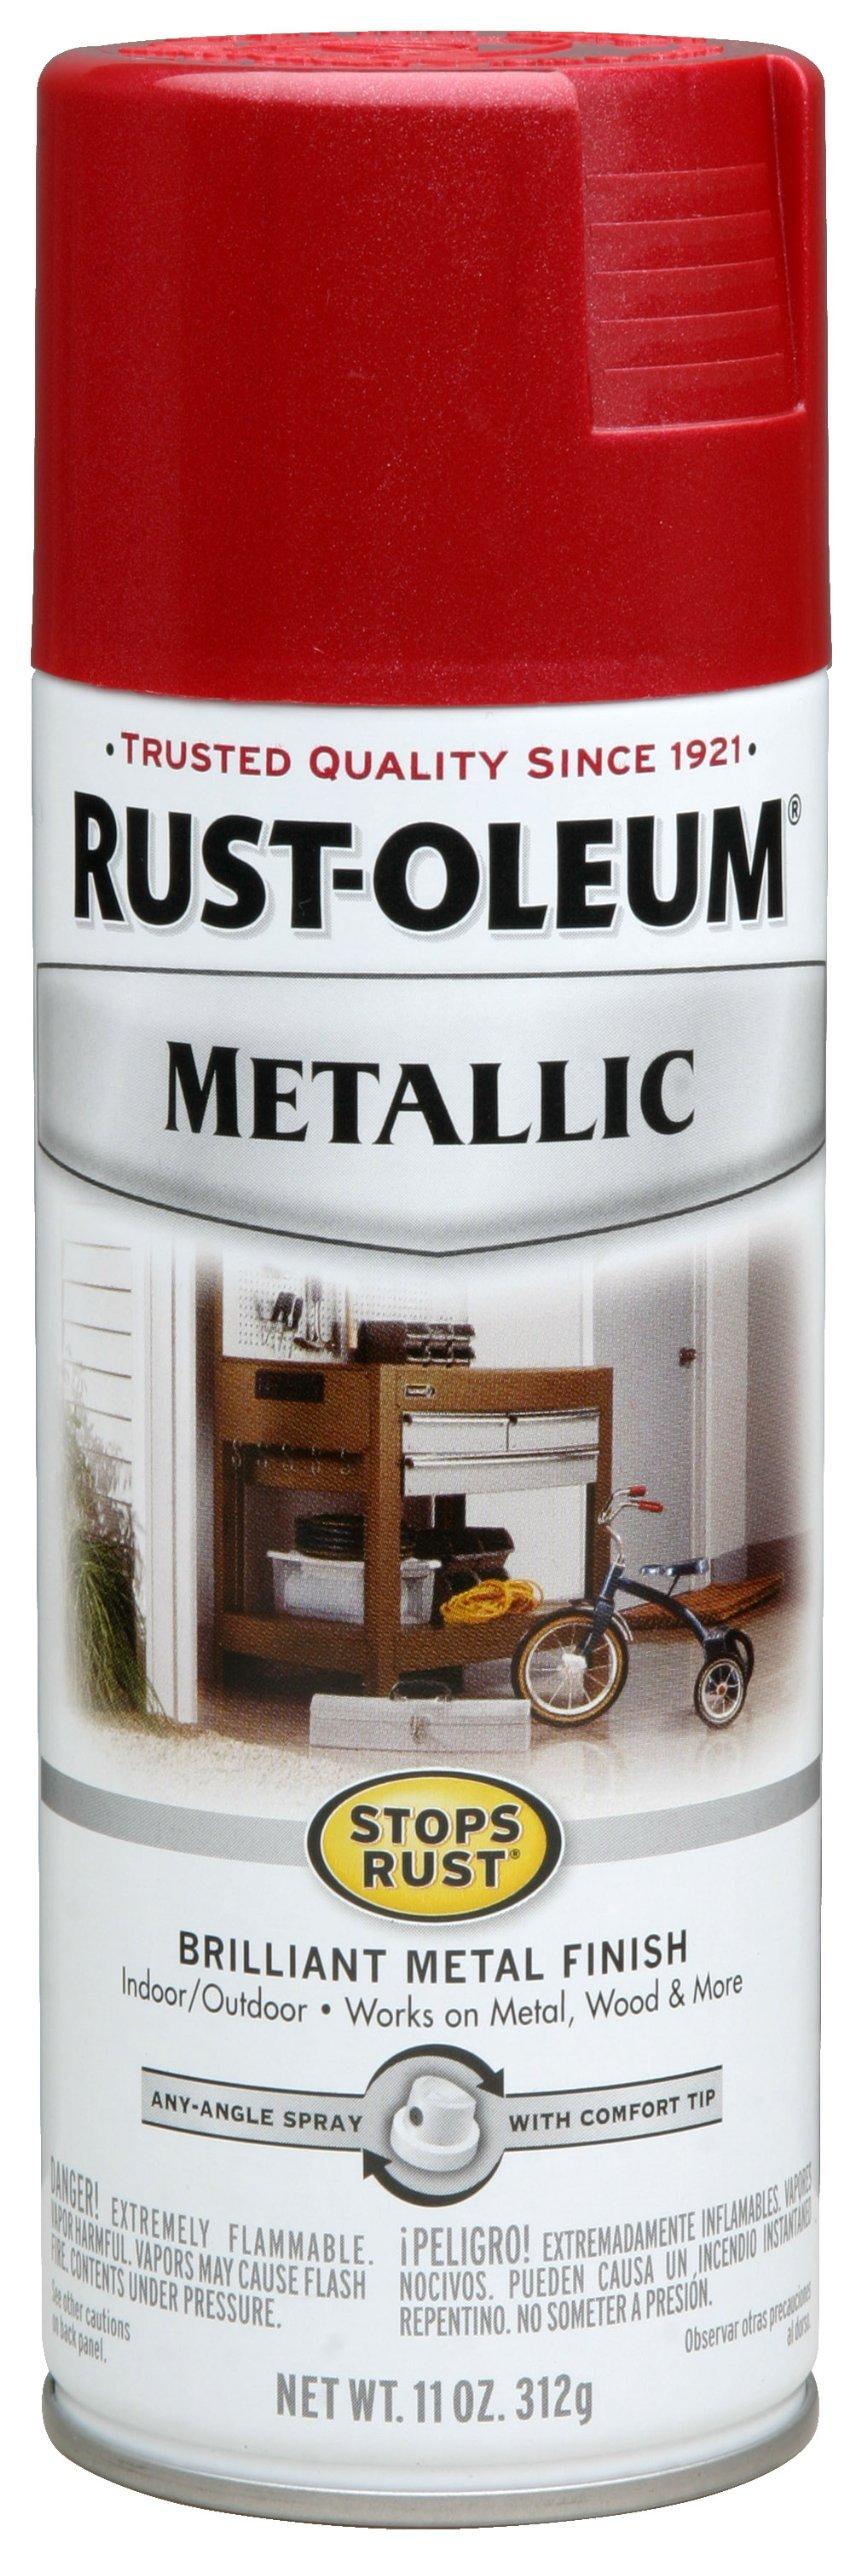 Rust-Oleum 7256830 Stops Rust Metallic Spray Paint, 11 oz, Apple Red by Rust-Oleum